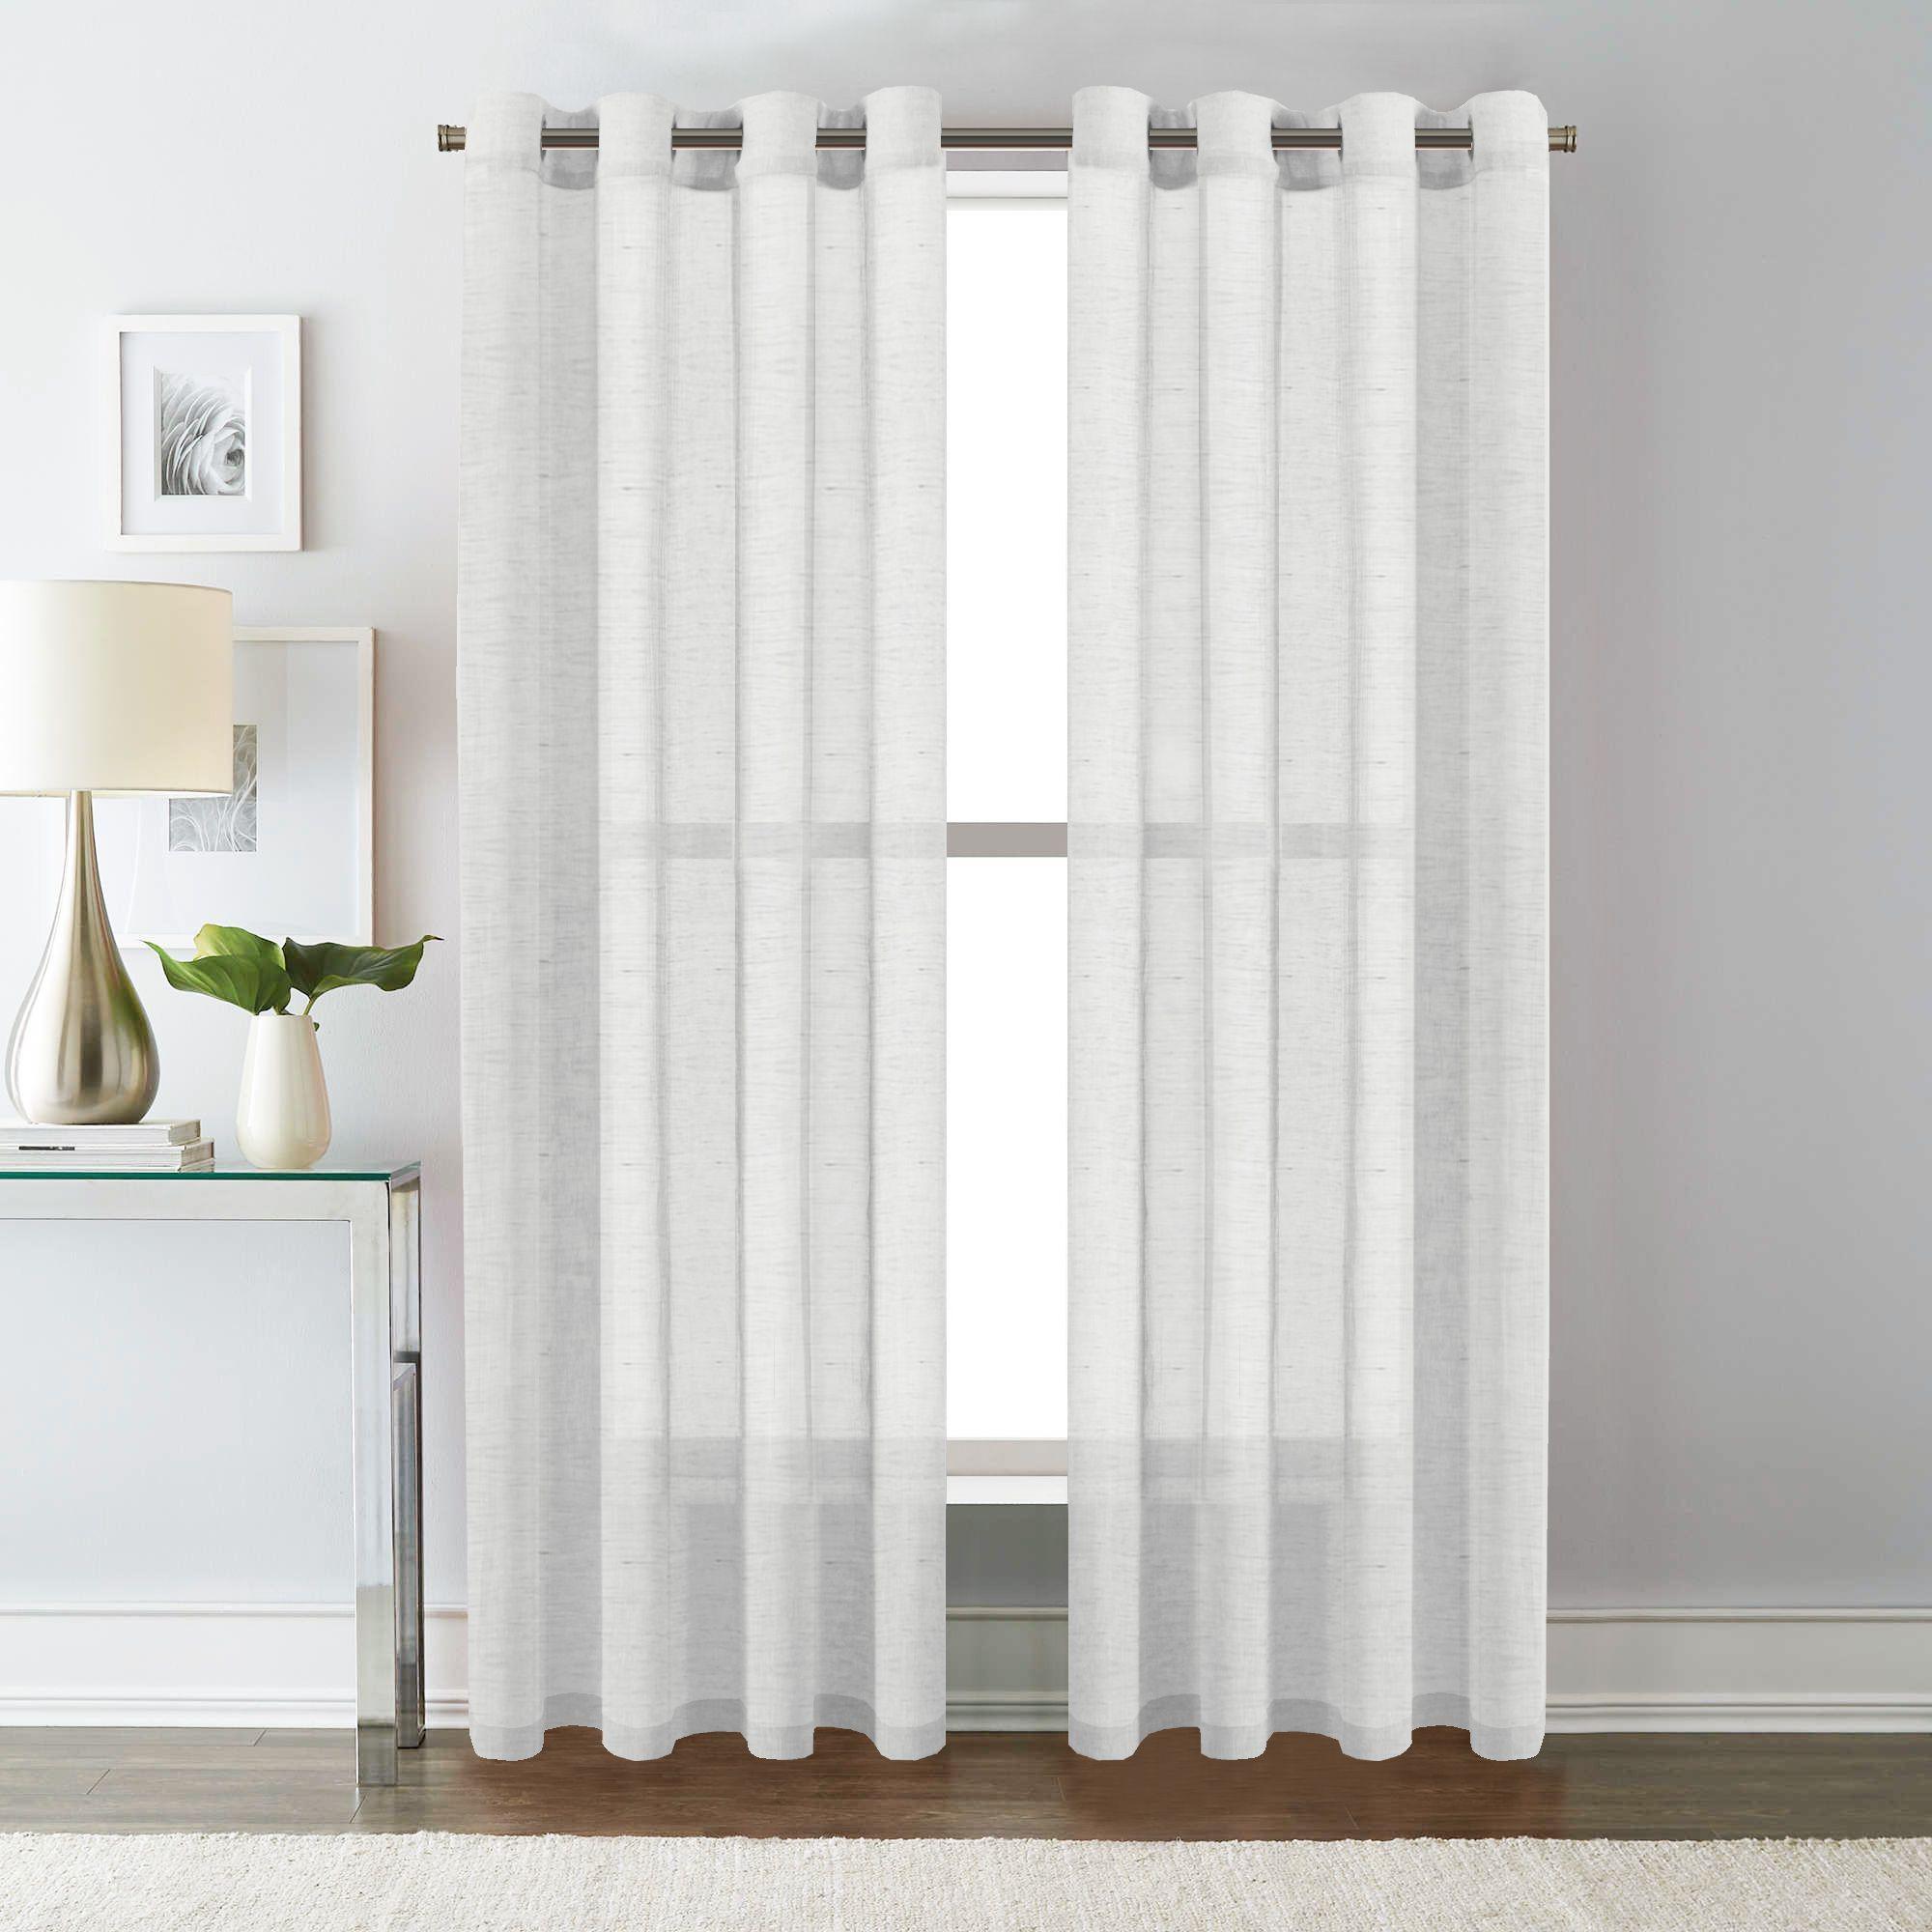 Linen Sheer White Curtains Pair Living Room Sheer Linen Curtains Window Treatment Draperies Eyelet Indoor Curtains 2 Panels Solid White Matt Blatt